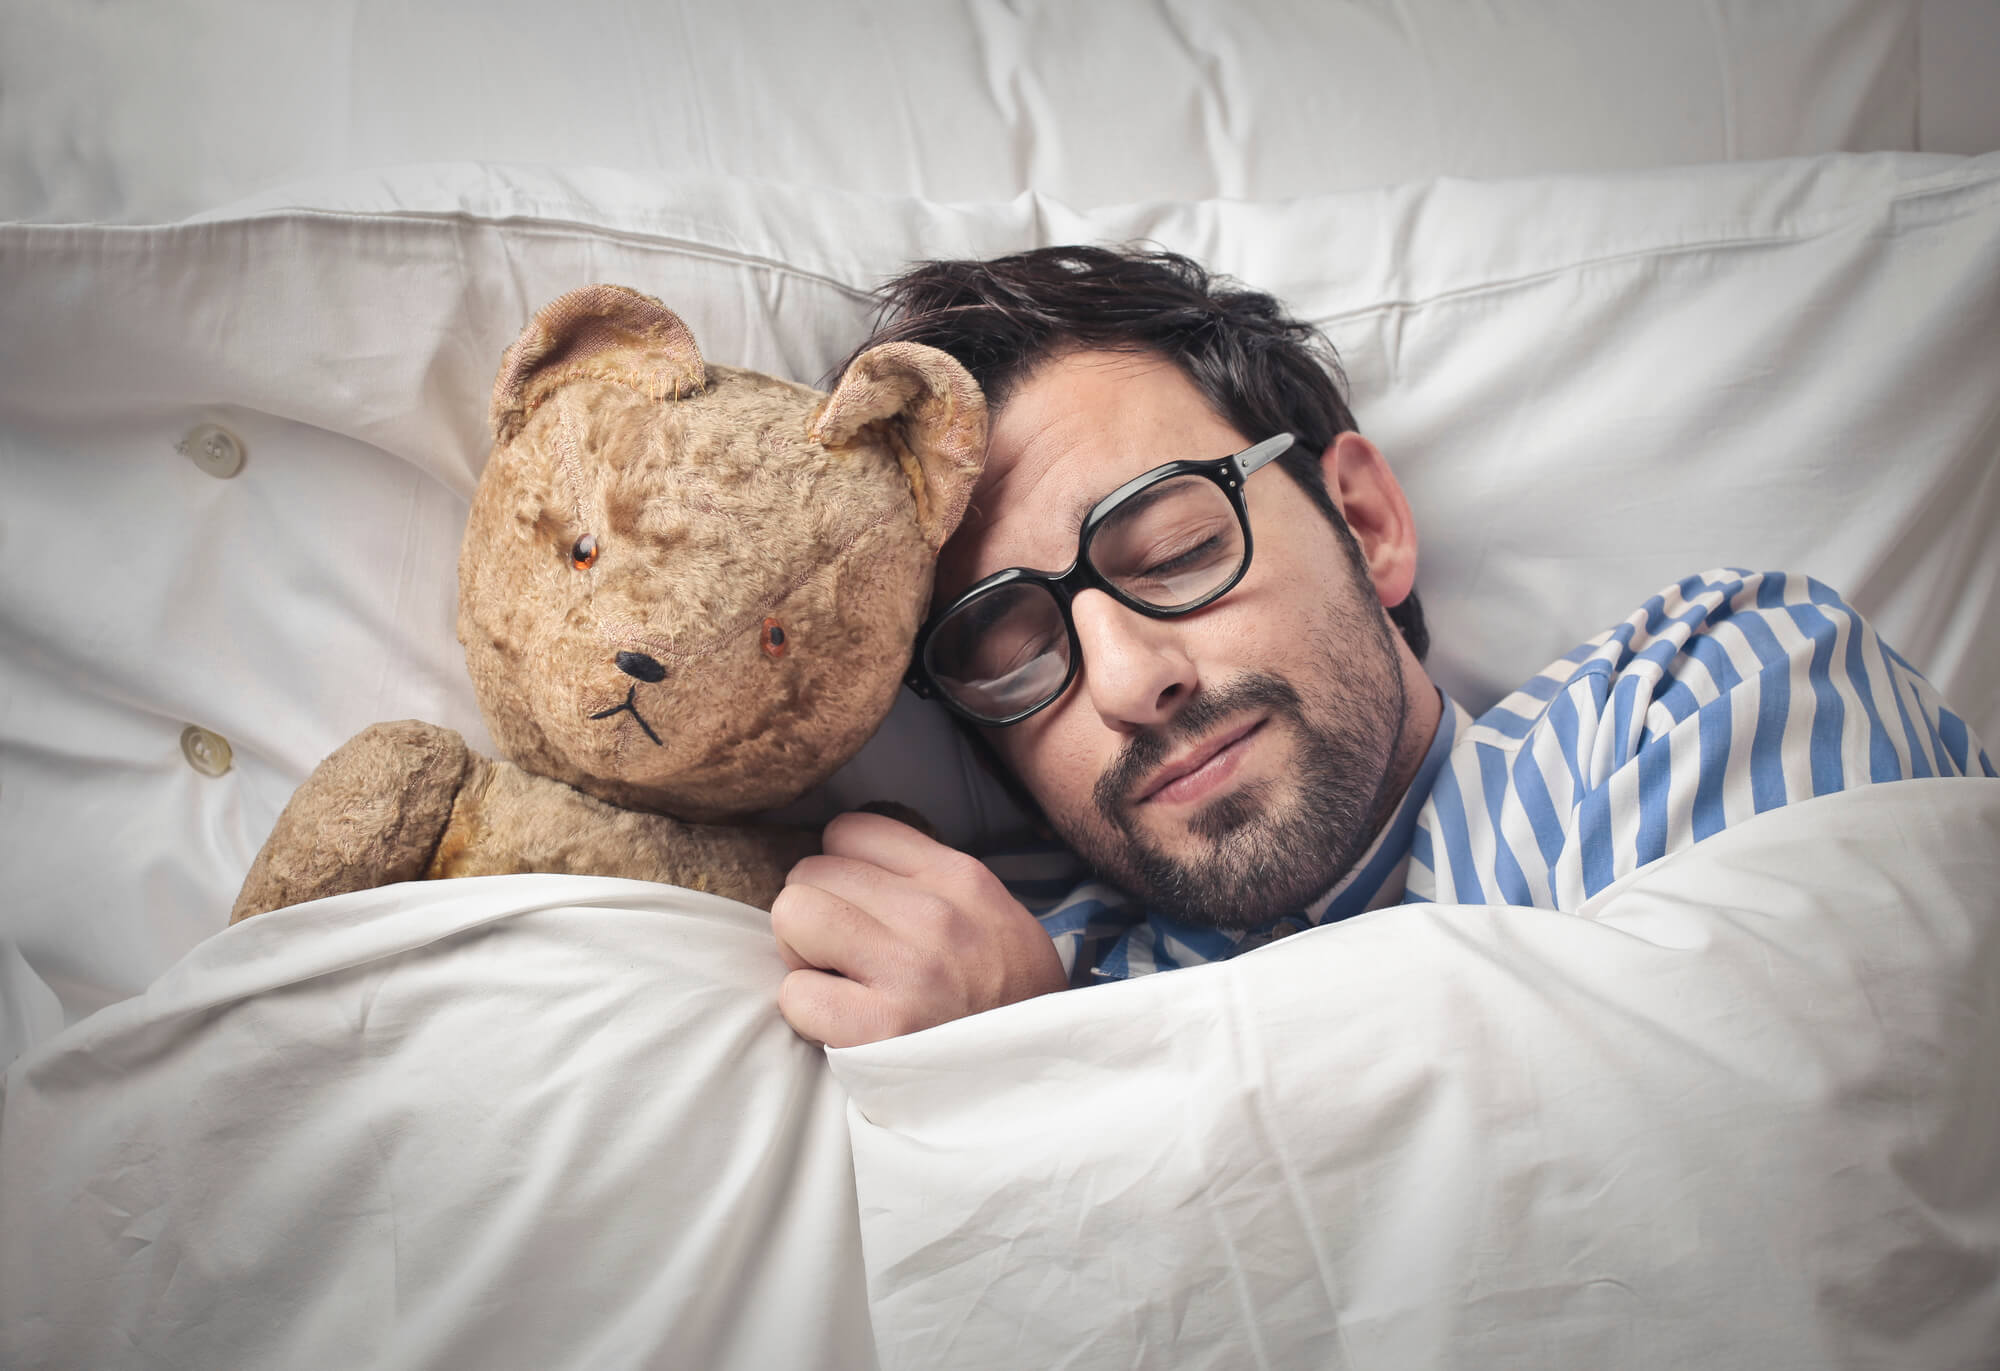 Adult man snuggling teddy bear, sleeping in bed.